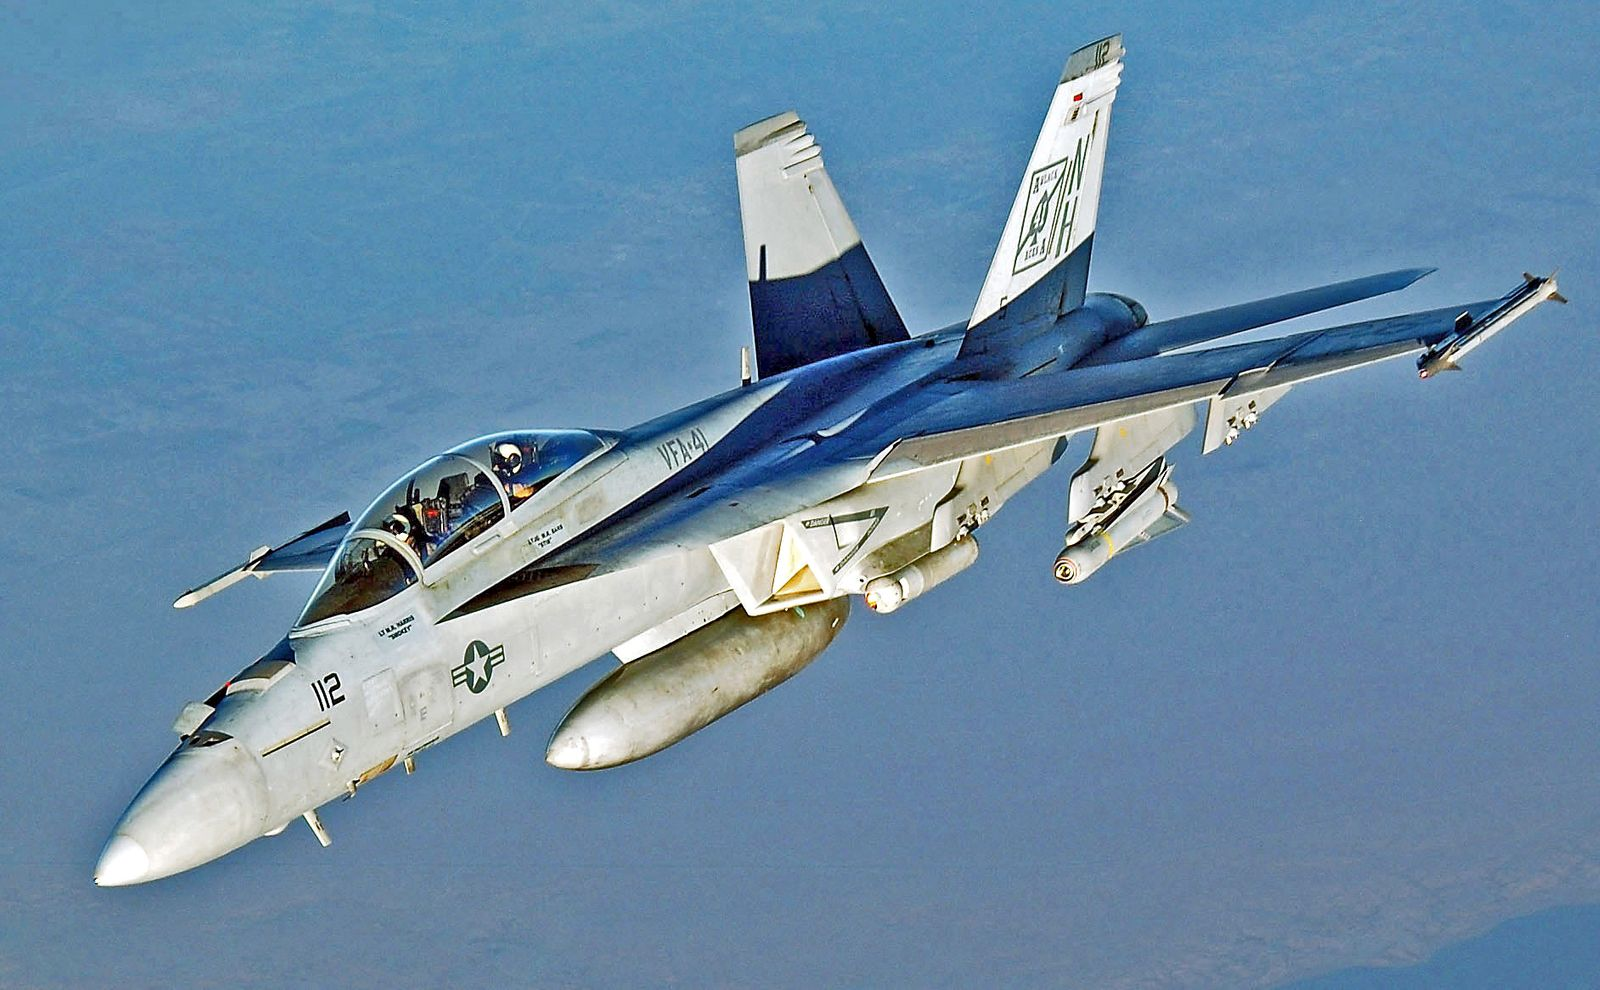 Boeing F/A-18F Super Hornet